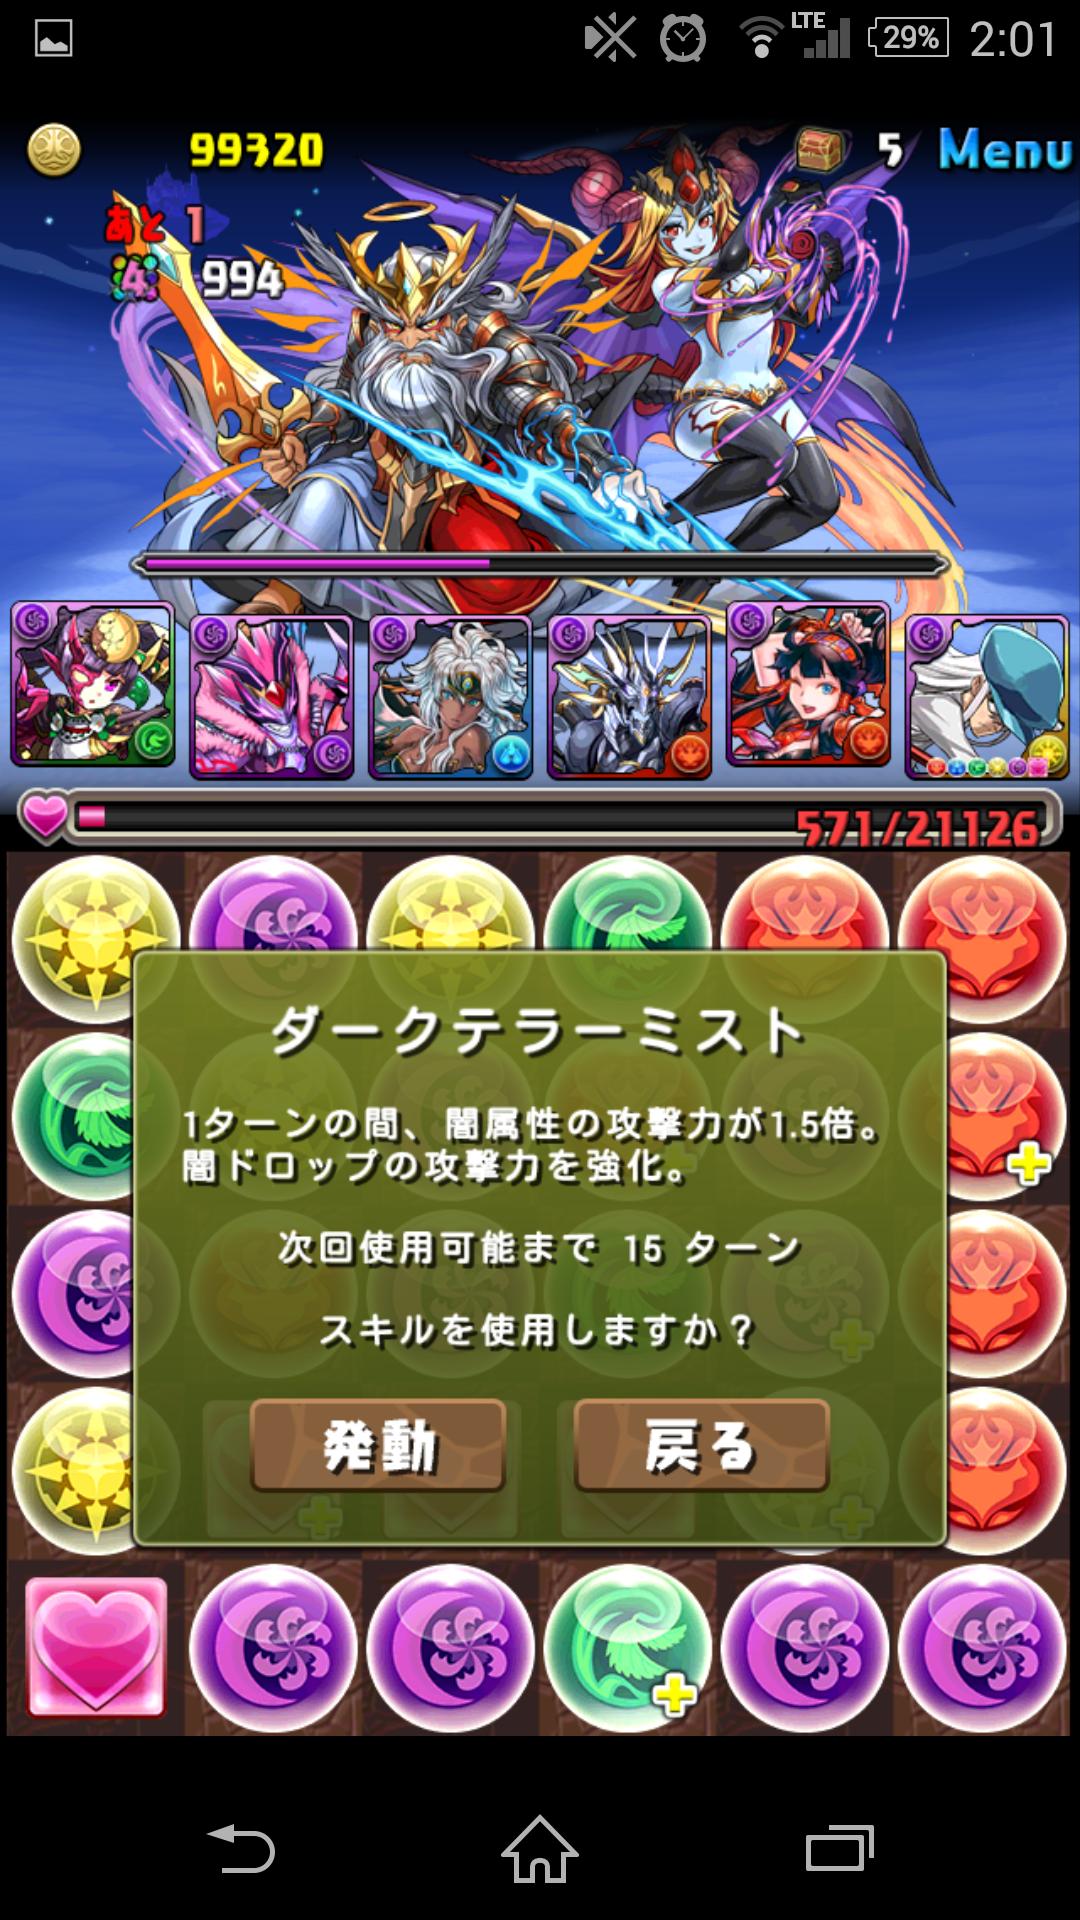 Screenshot_2015-09-01-02-01-27.png